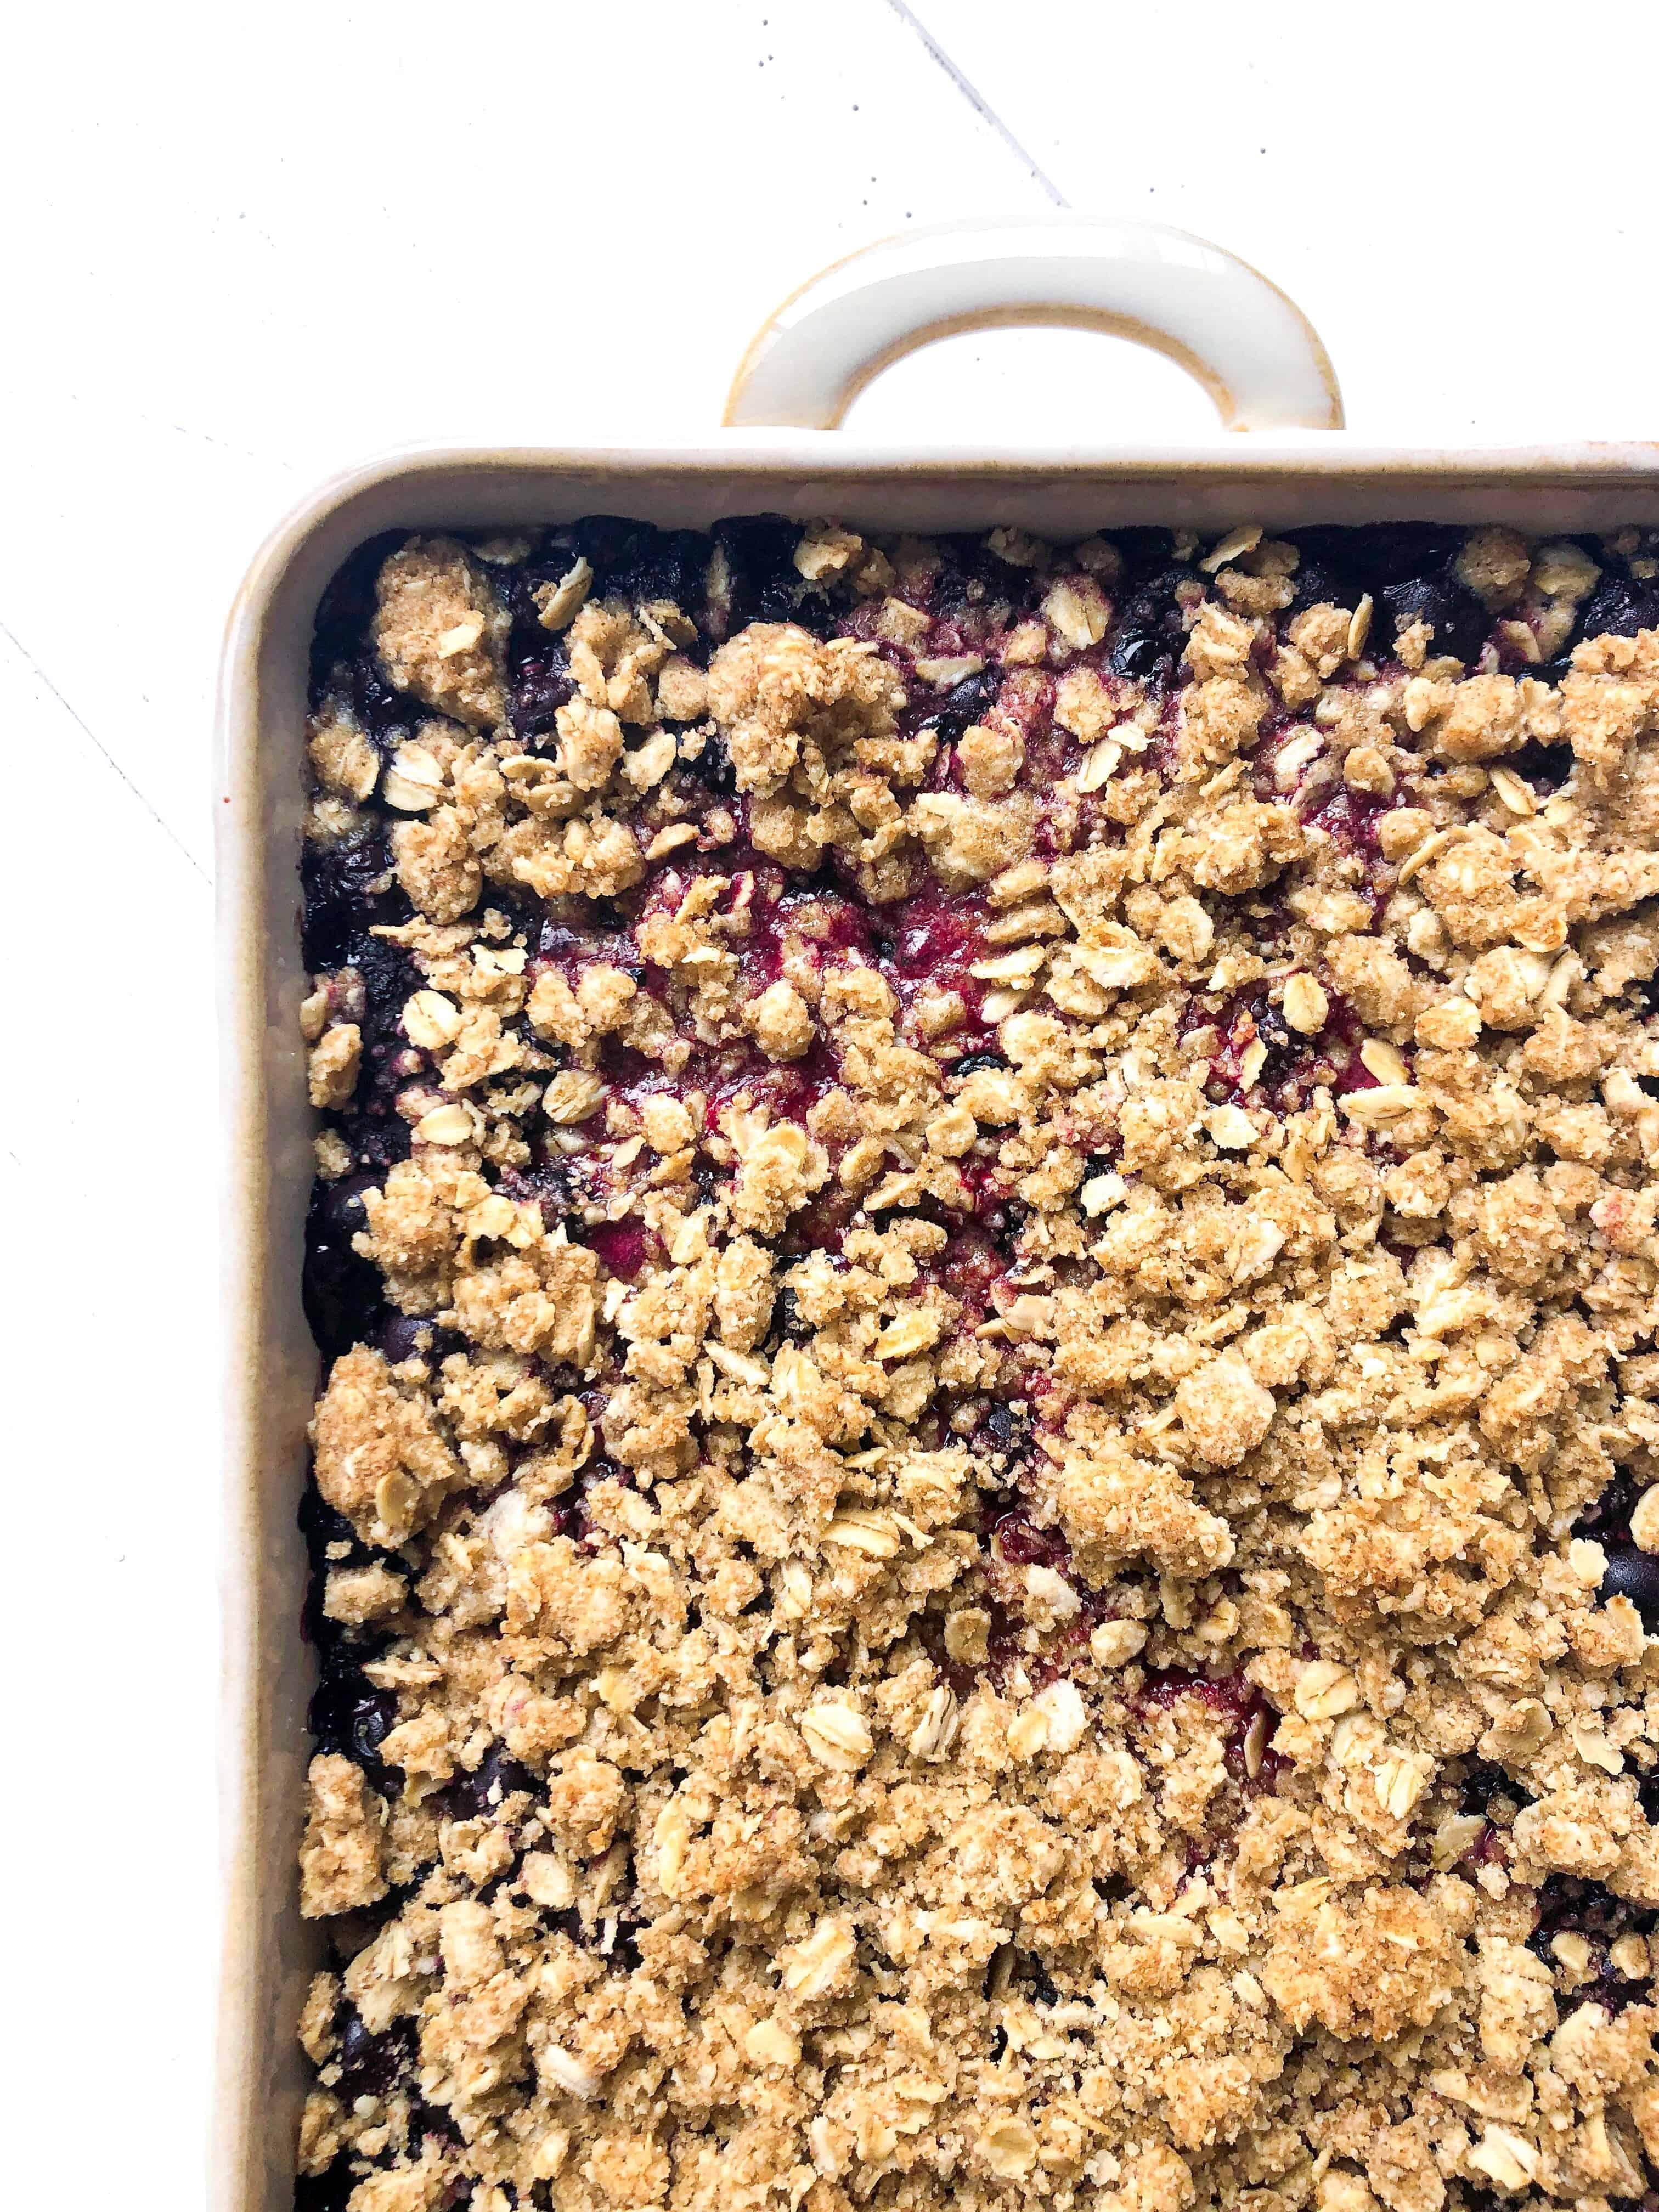 A gluten free berry crisp in a baking pan